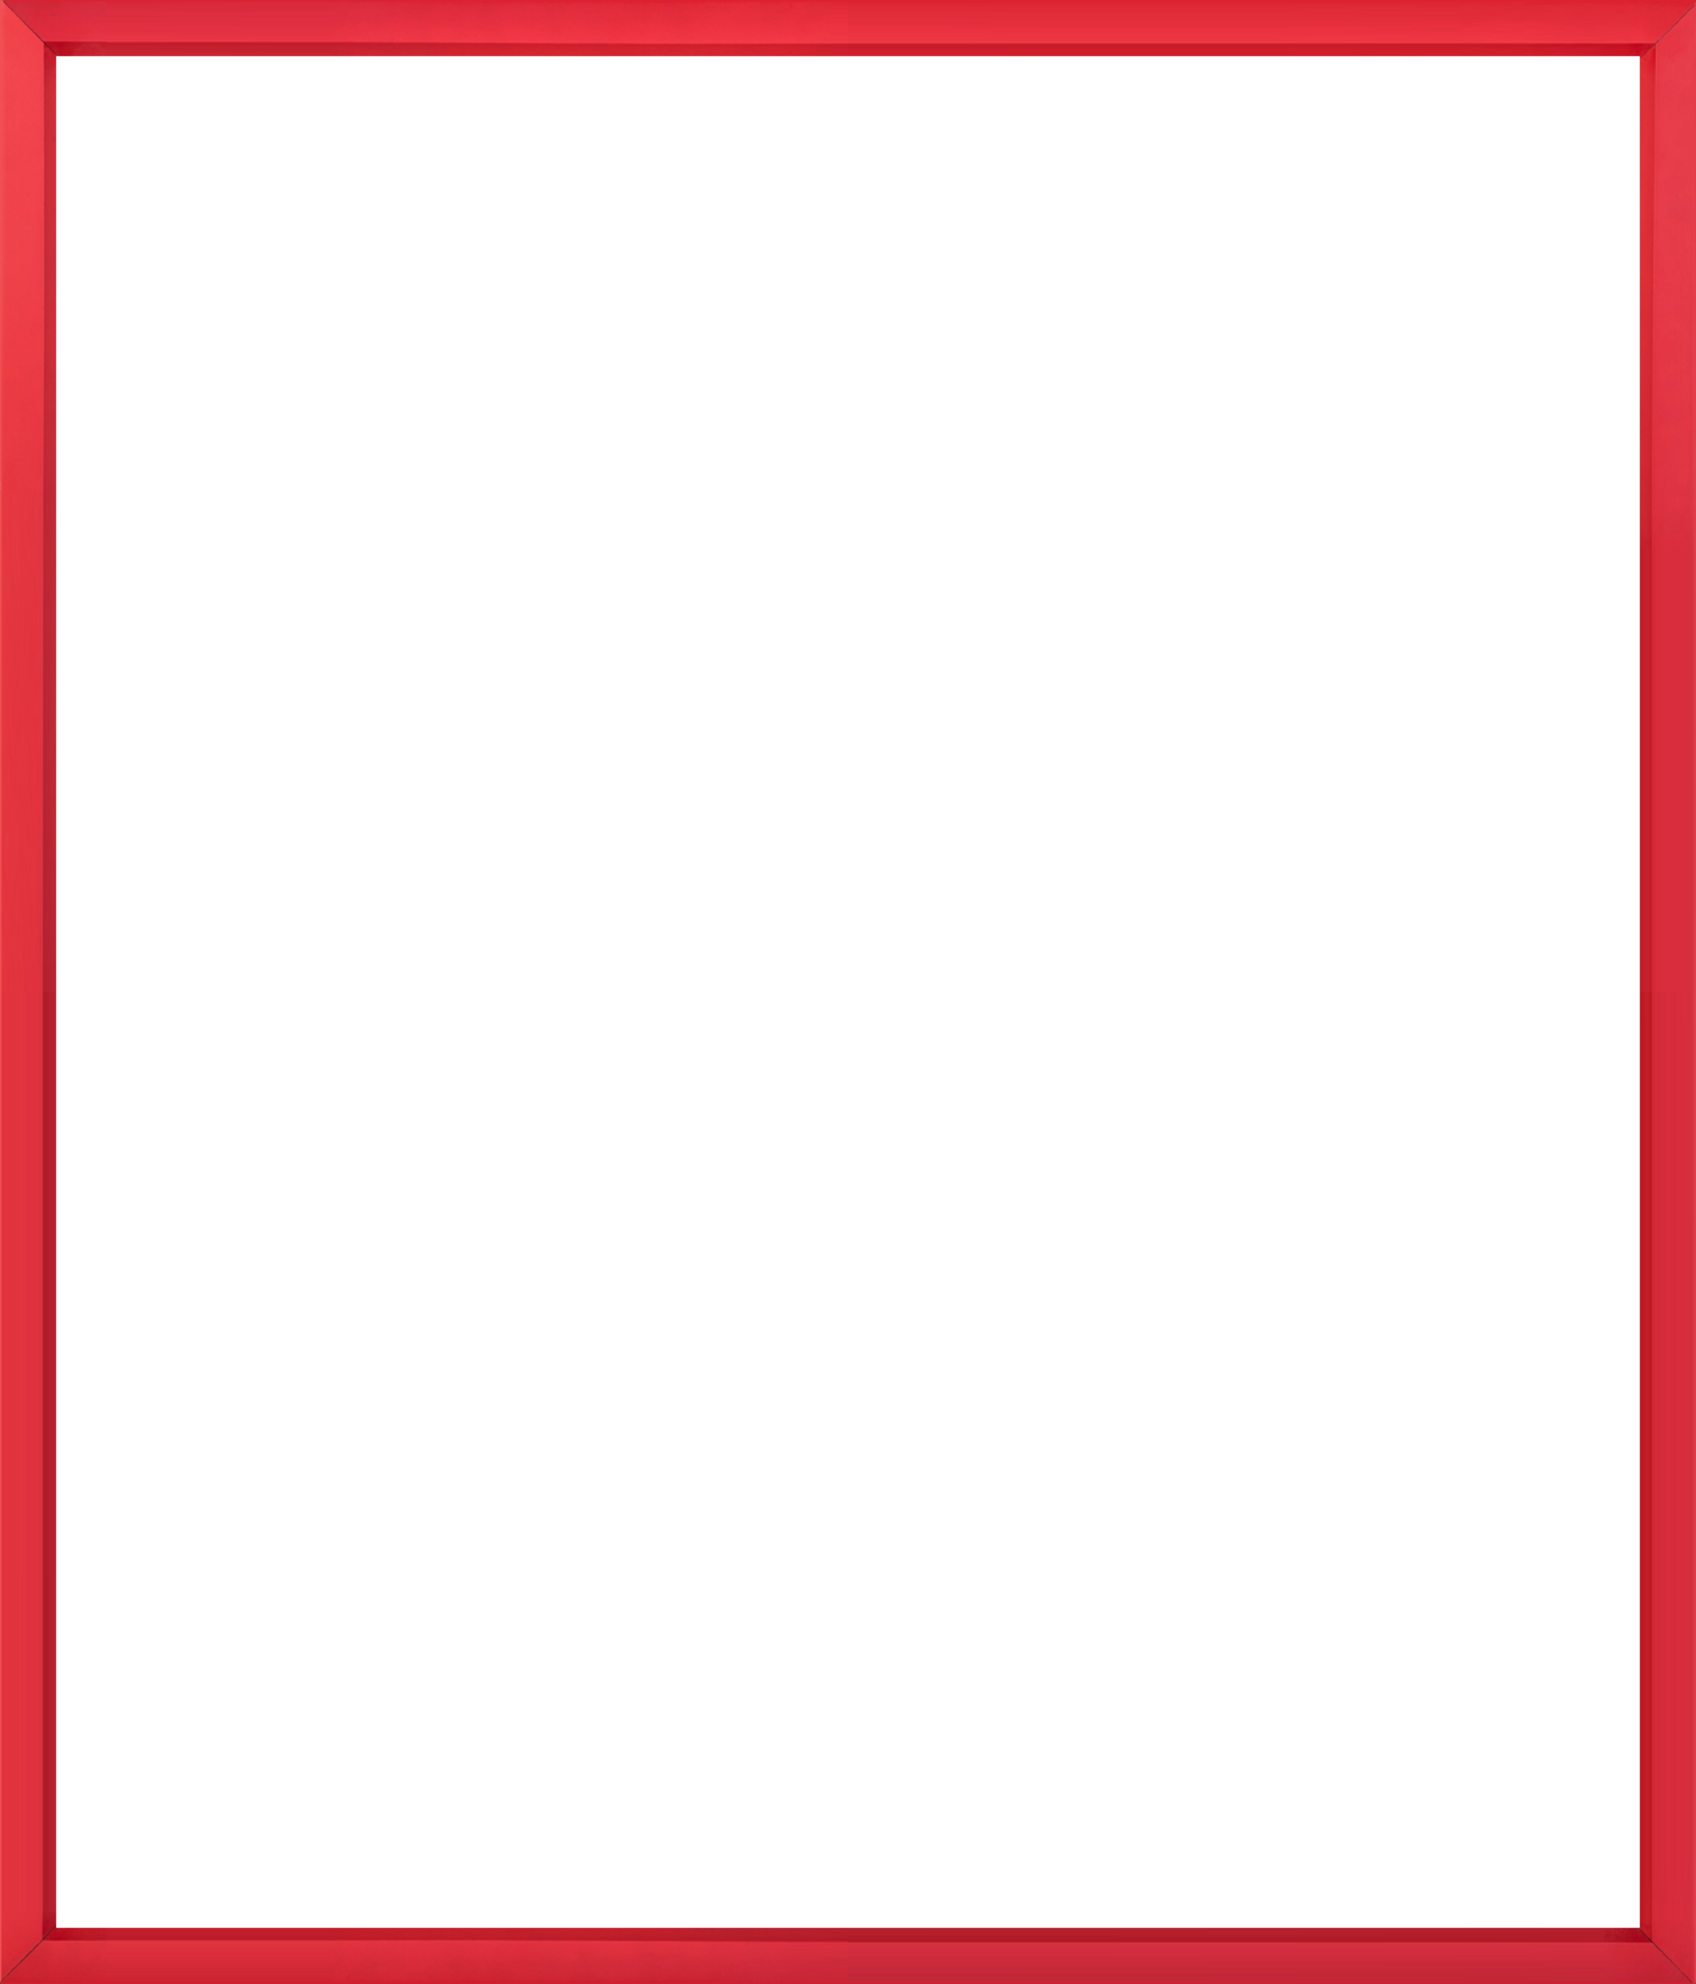 815-1426661639